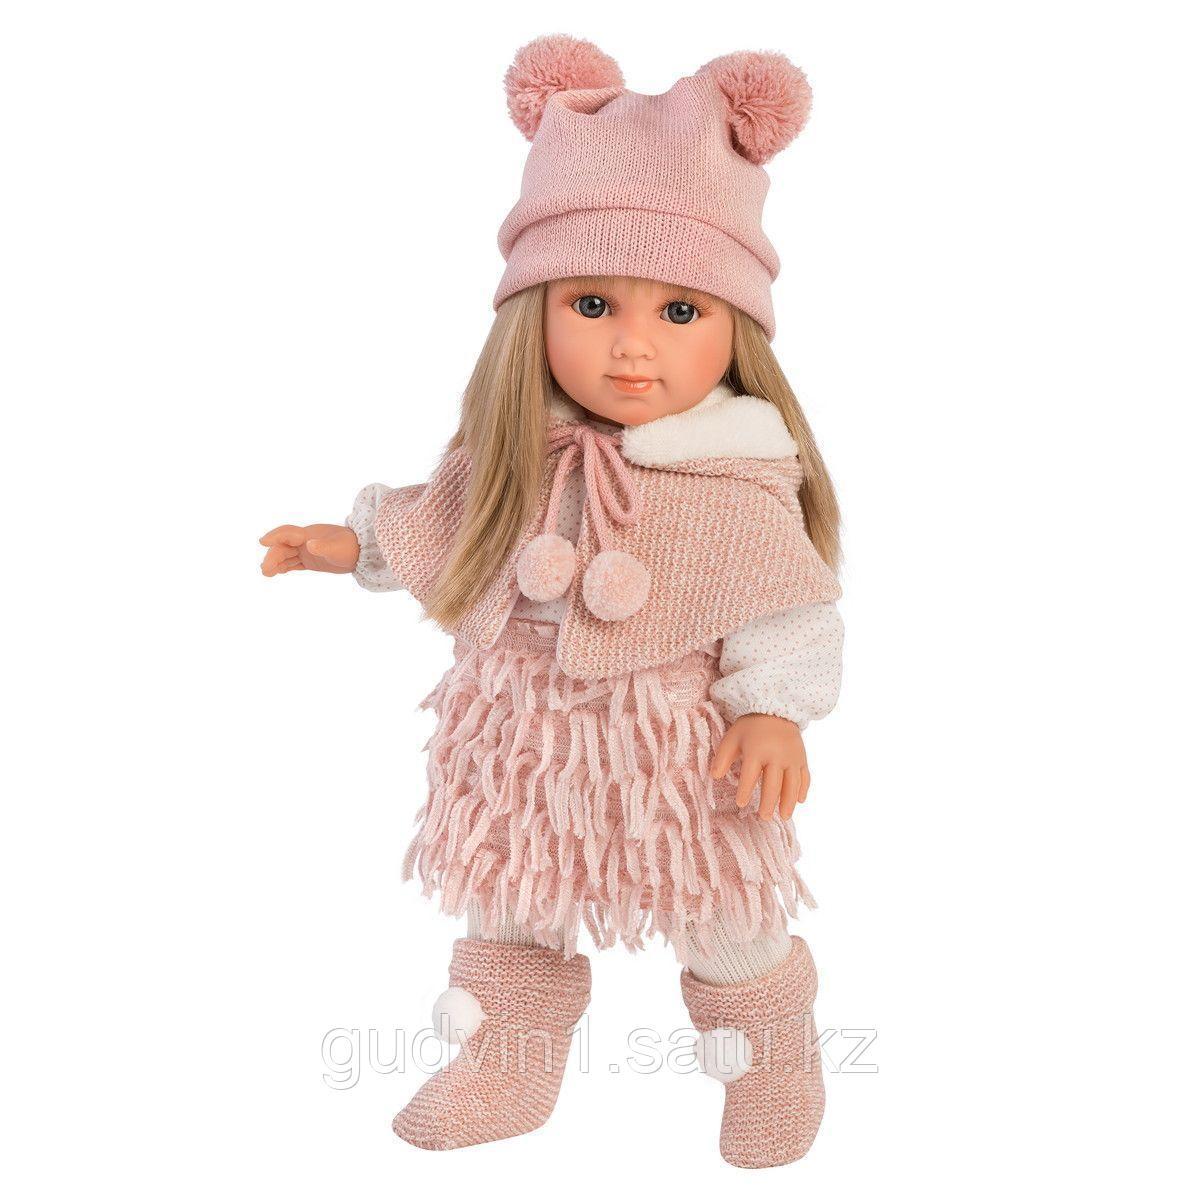 LLORENS: Кукла Елена 35см, блондинка в розовом костюме и шапке с двумя пумпонами 53525